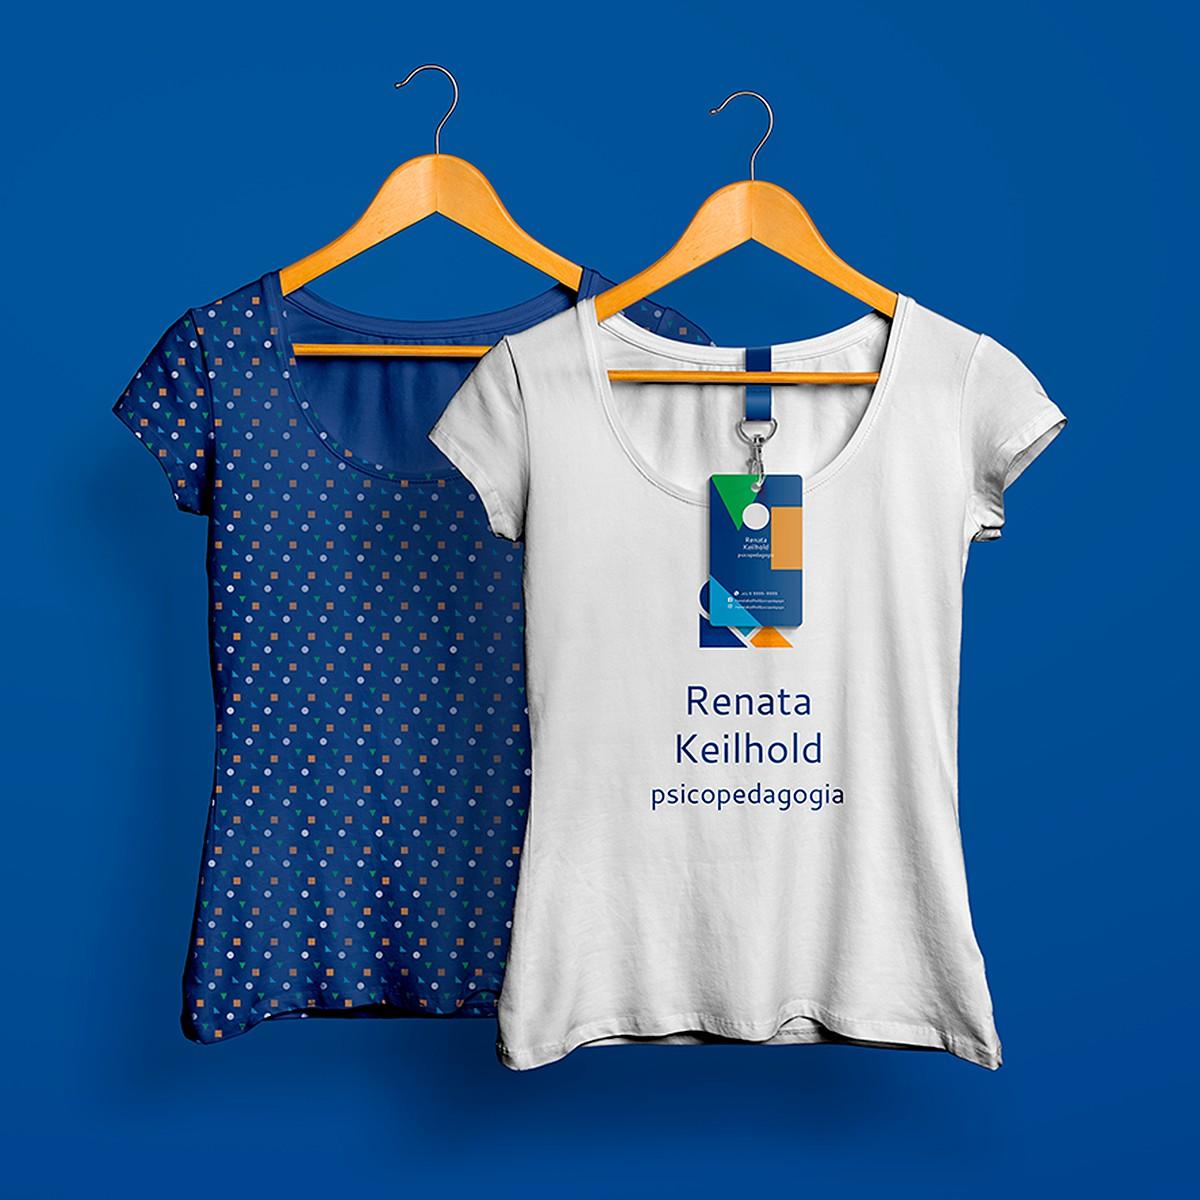 Renata Keilhold青少年心理咨询品牌VI设计